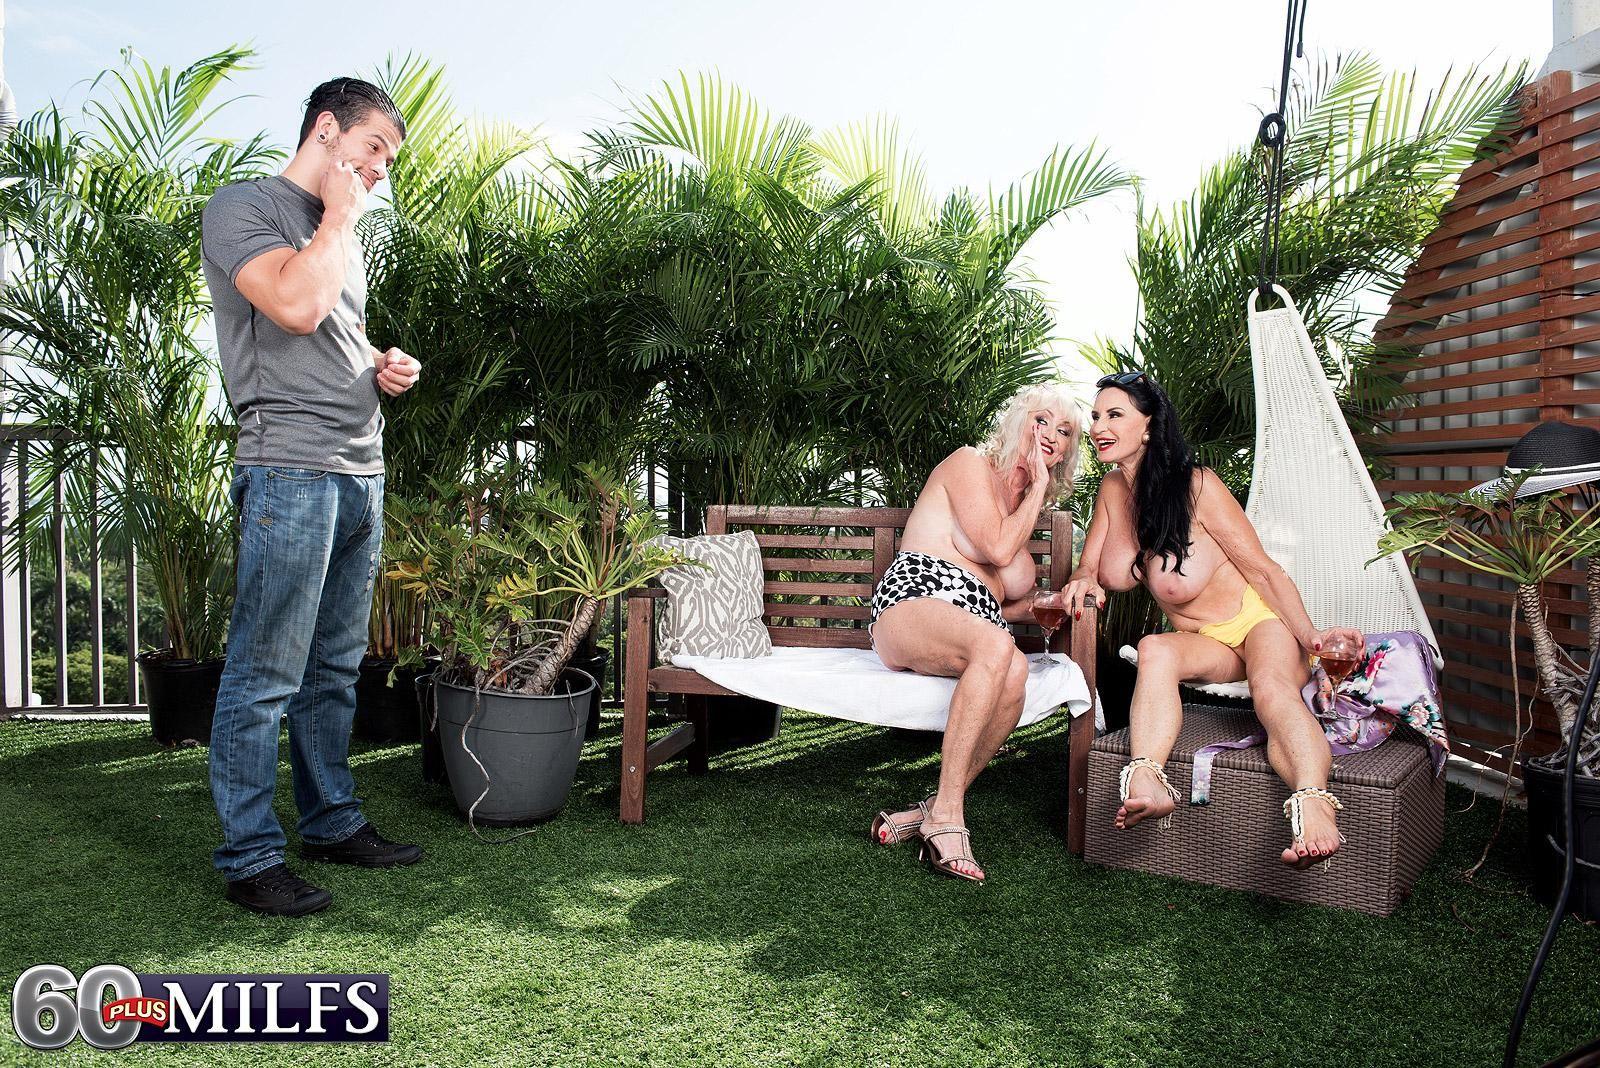 60 plus MILF Rita Daniels and her topless girlfriend lick and jerk a boy's hard cock